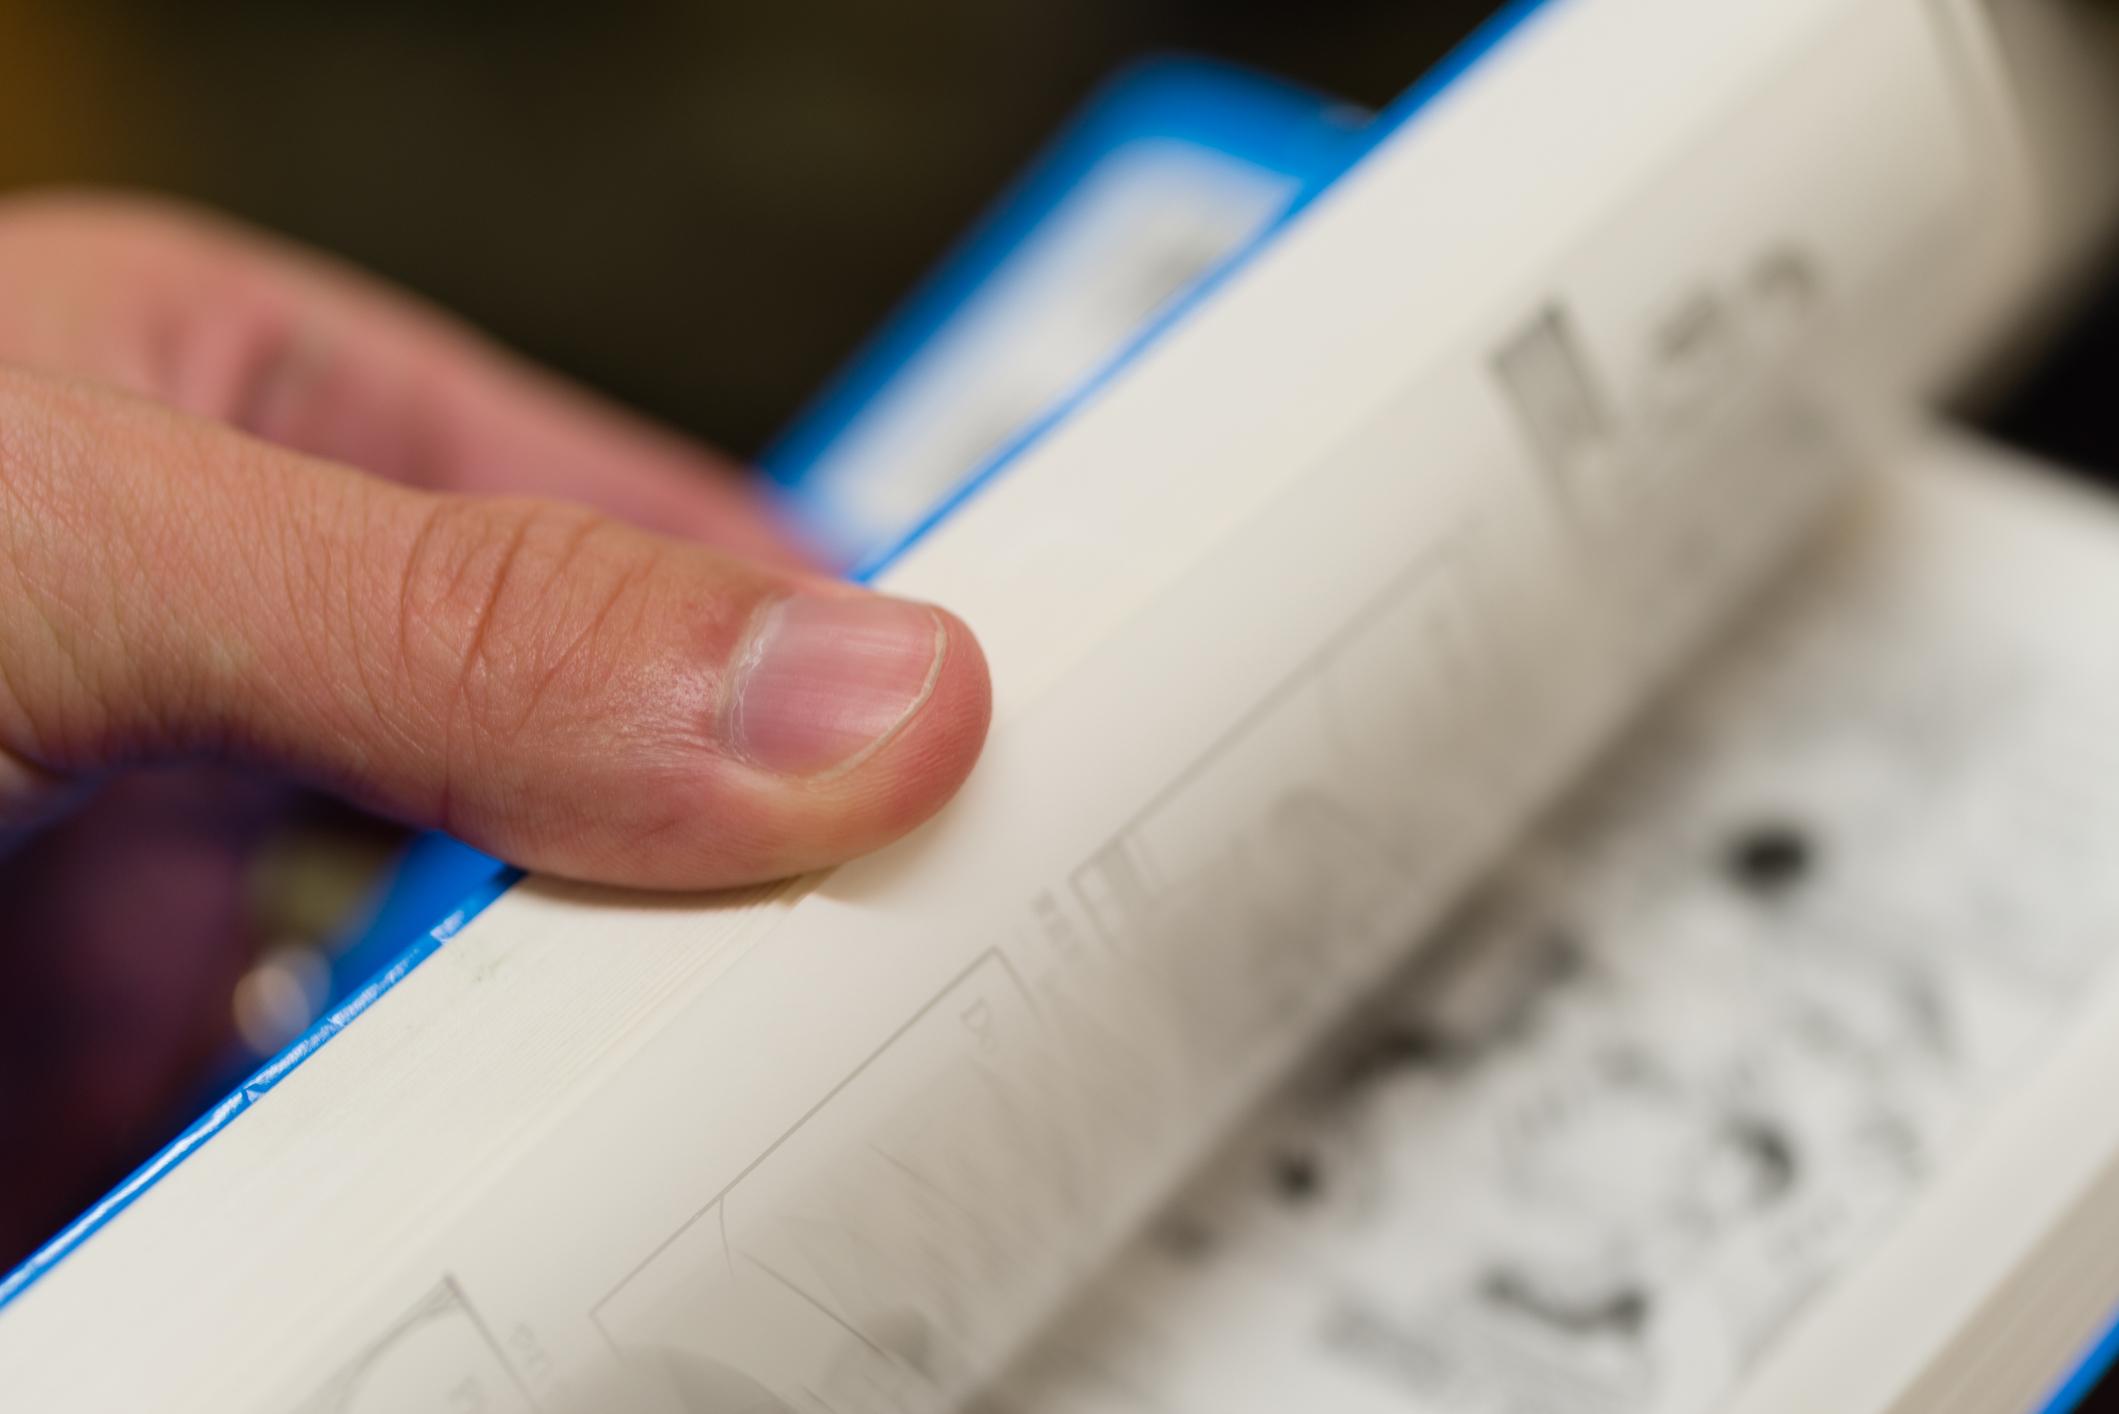 person flipping through a graphic novel